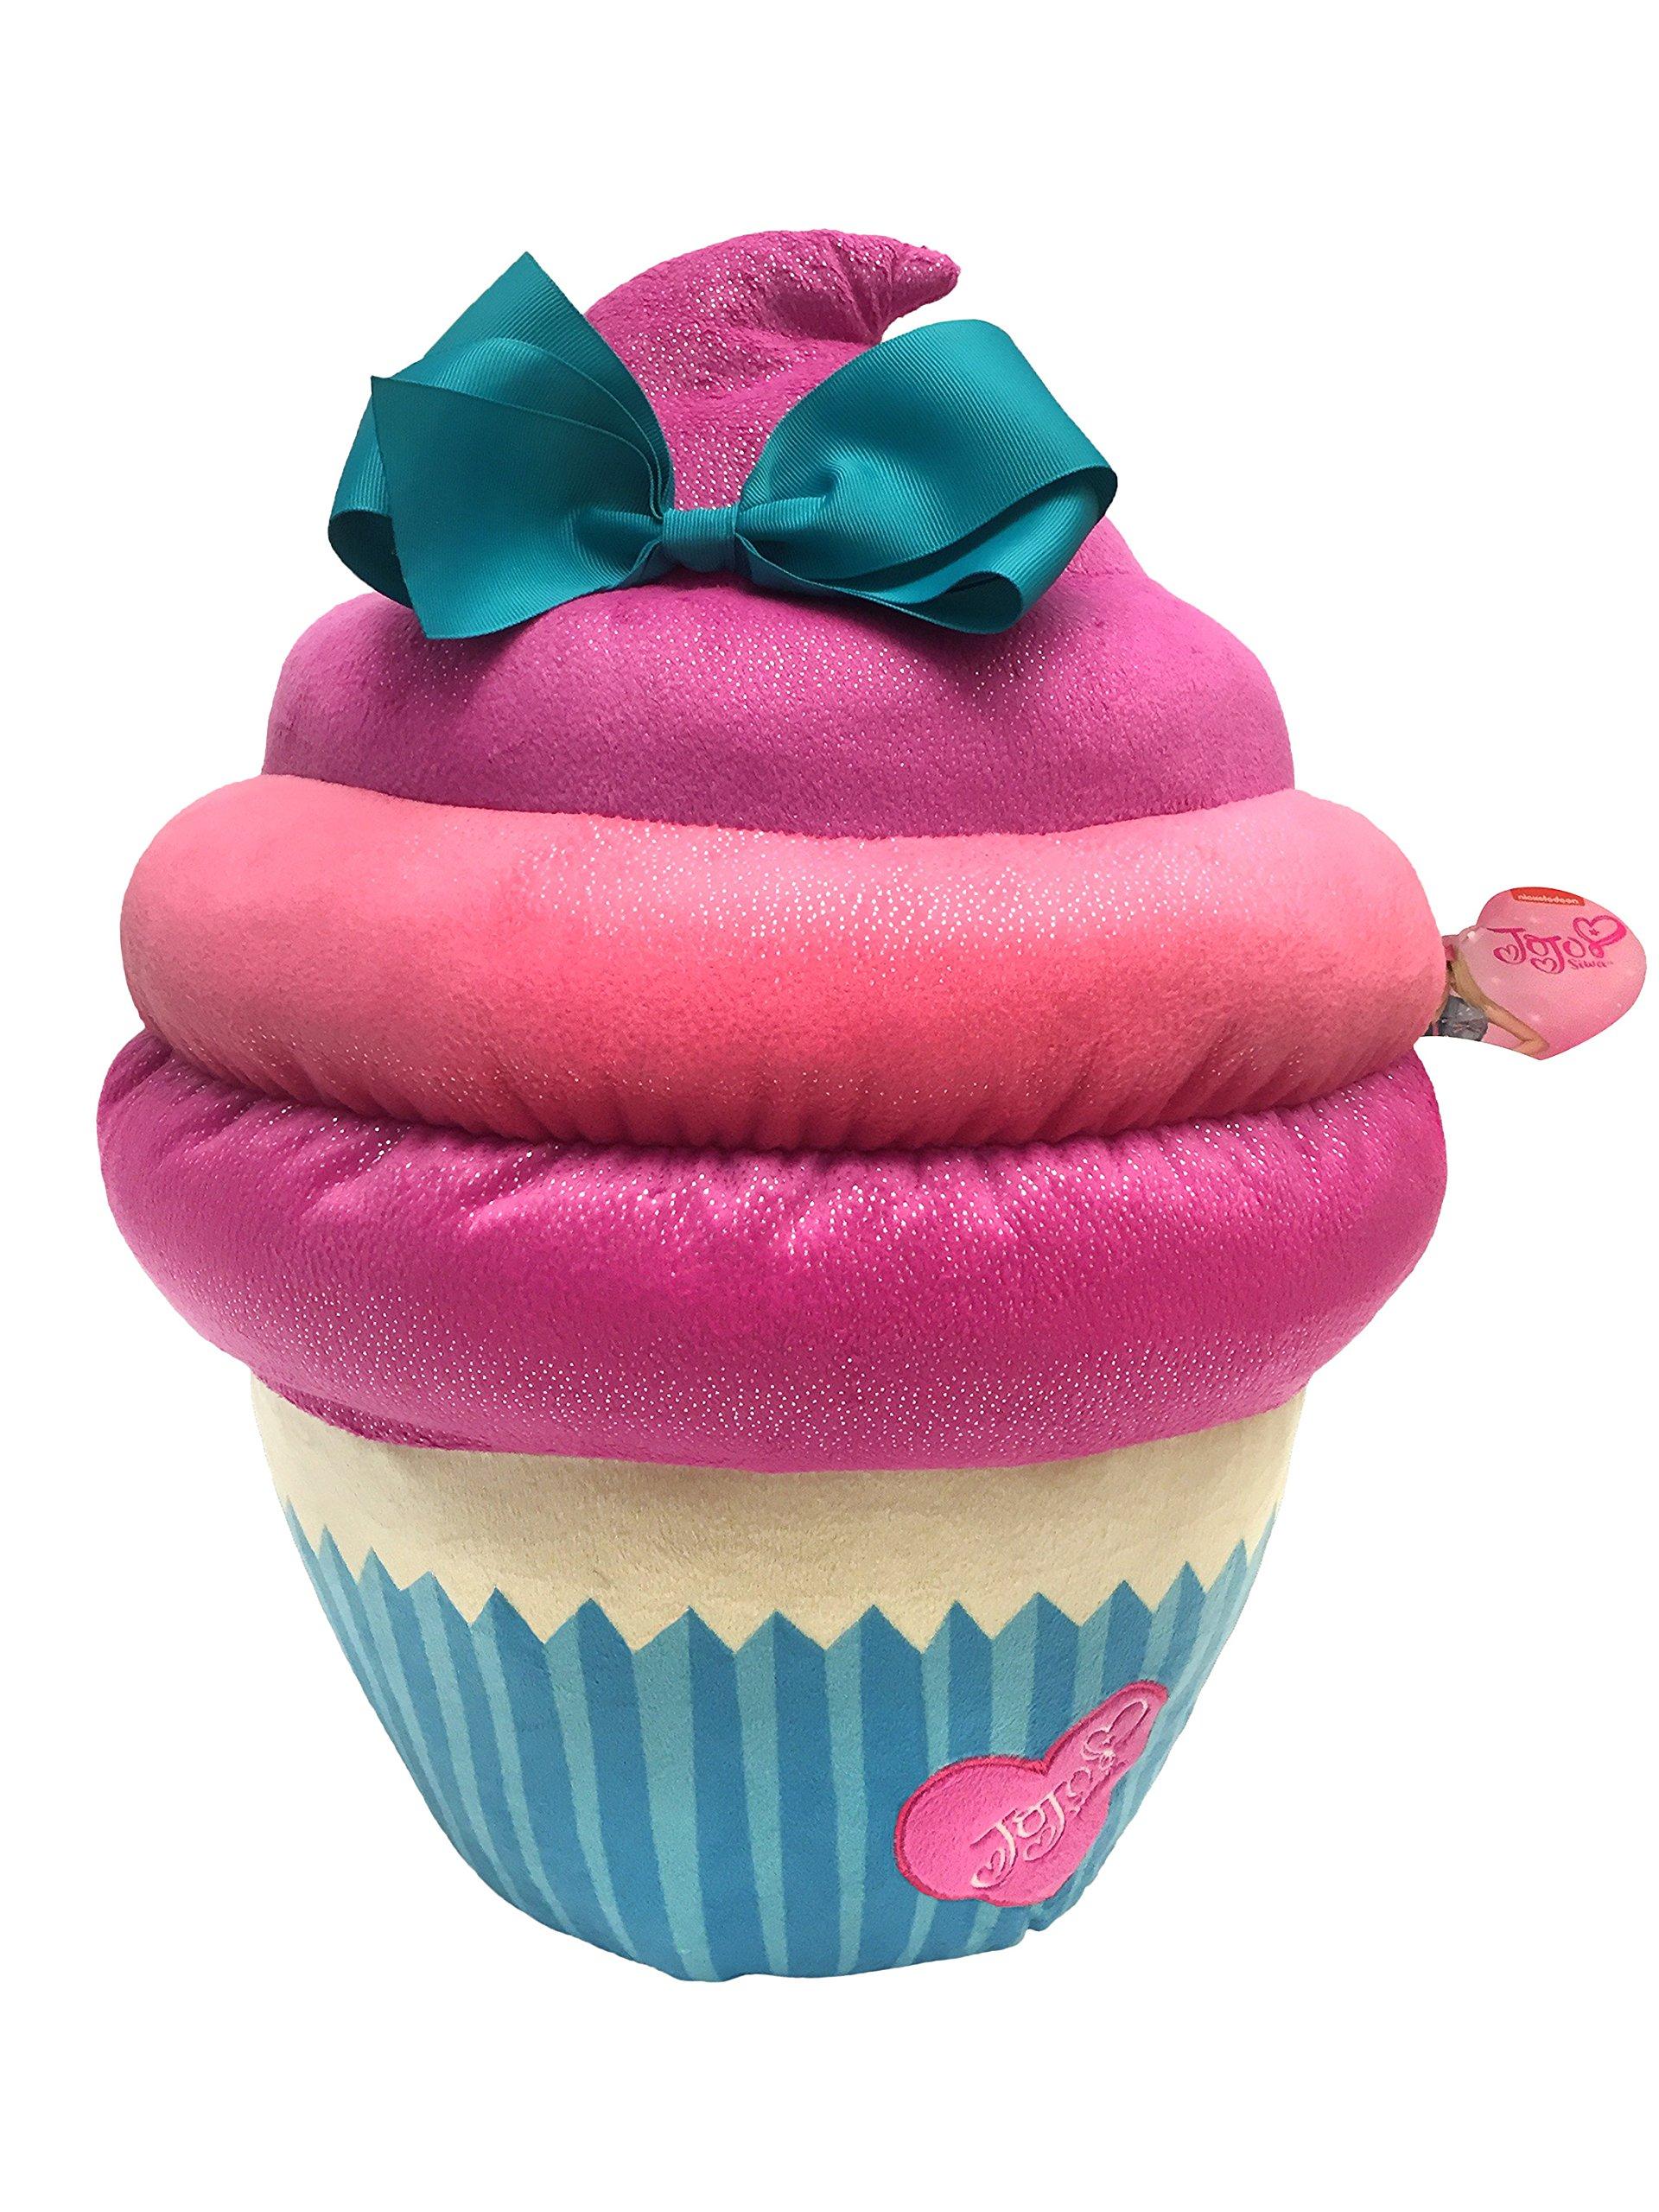 "Nickelodeon JoJo Siwa Large 17"" Plush Pink/Blue Sparkle Cupcake Pillow with Bow"